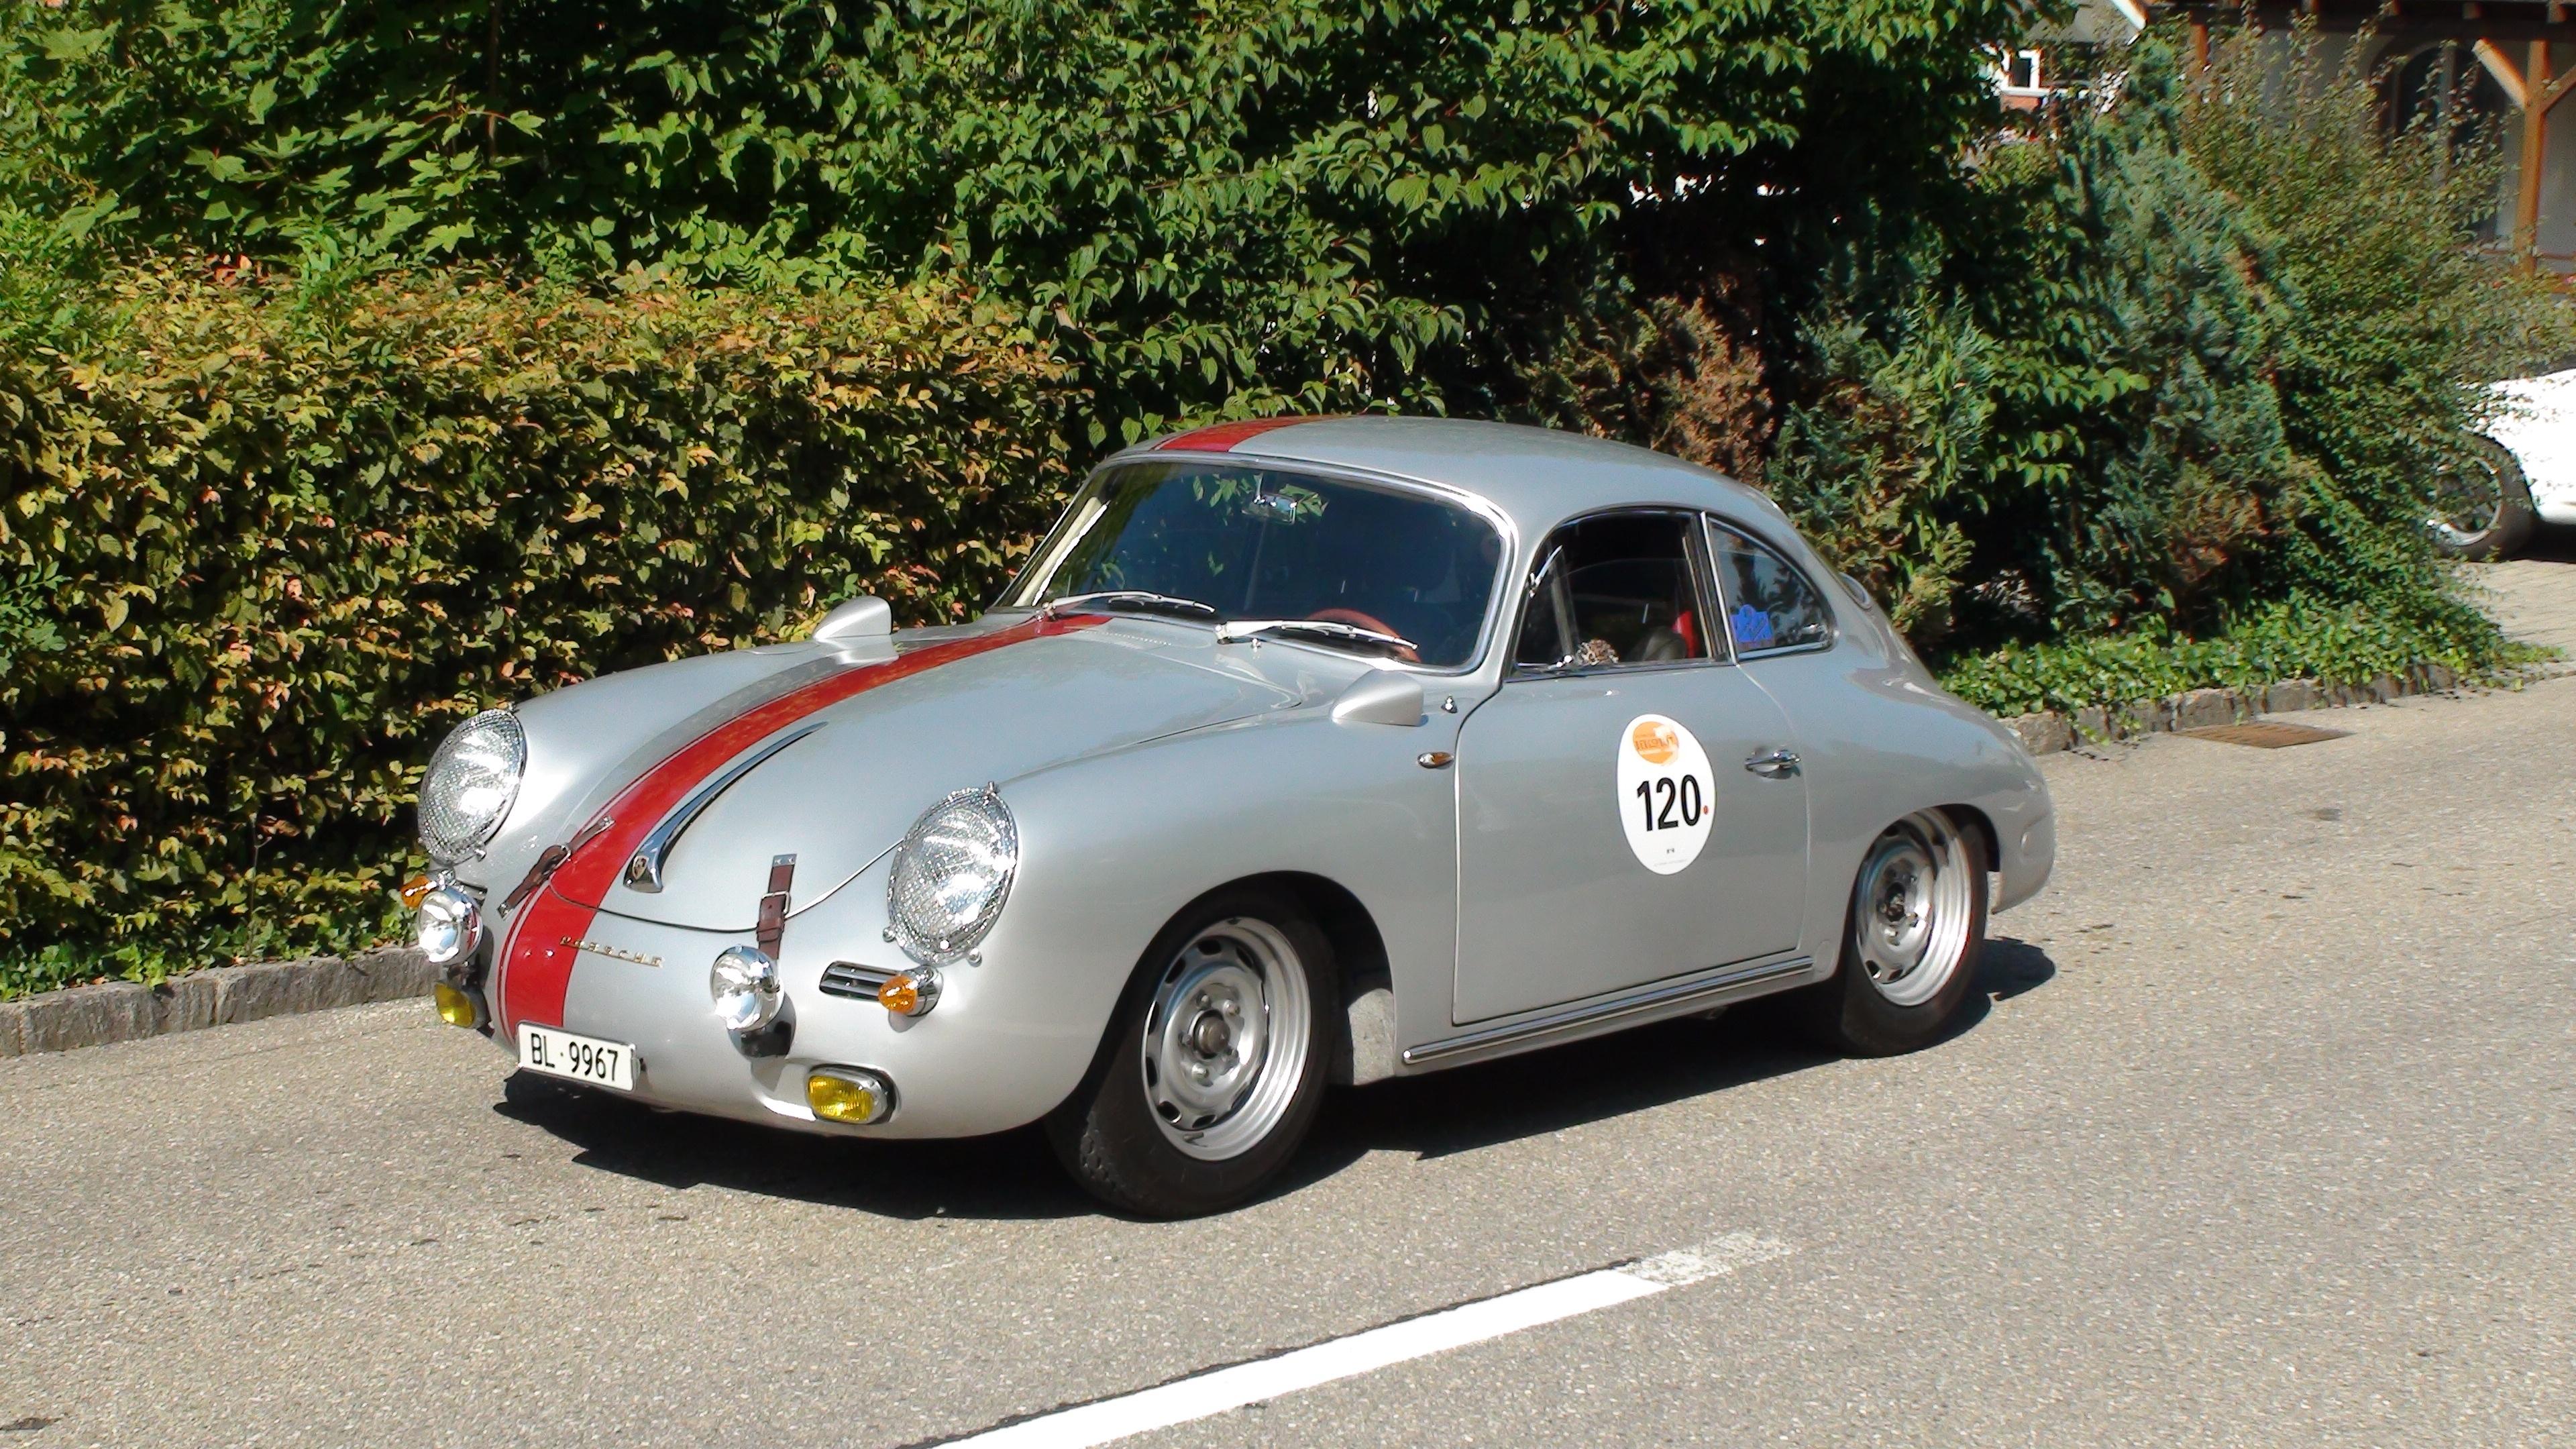 ... Auto, Classic Car, Sports Car, Oldtimer, Convertible, Antique Car, City  Car, Land Vehicle, Racing Porsche, Hillclimb, Walzenhausen, Volkswagen  Beetle, ...